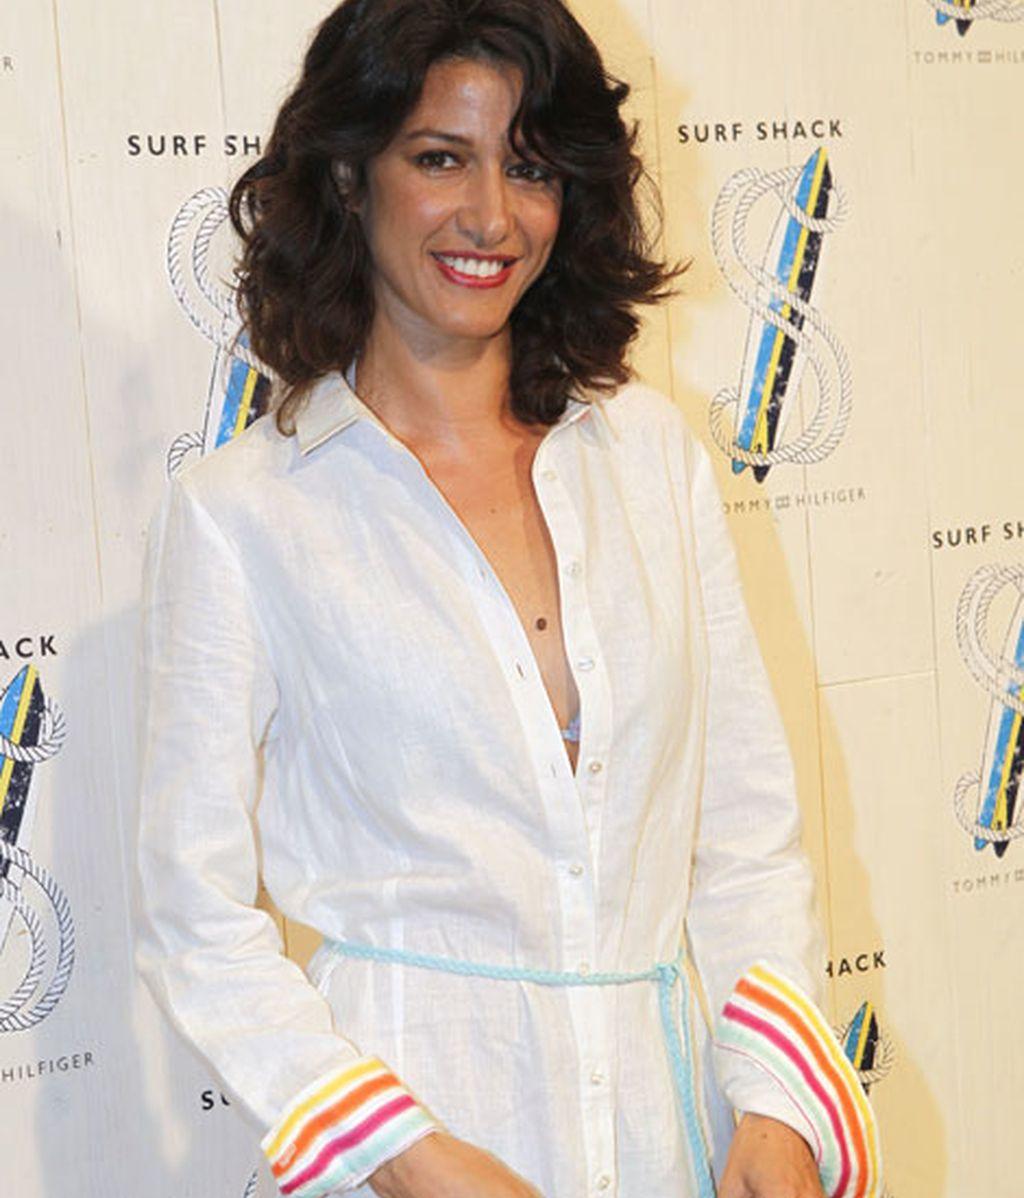 Jimena Mazzuco con un vestido liviano con detalles a rayas